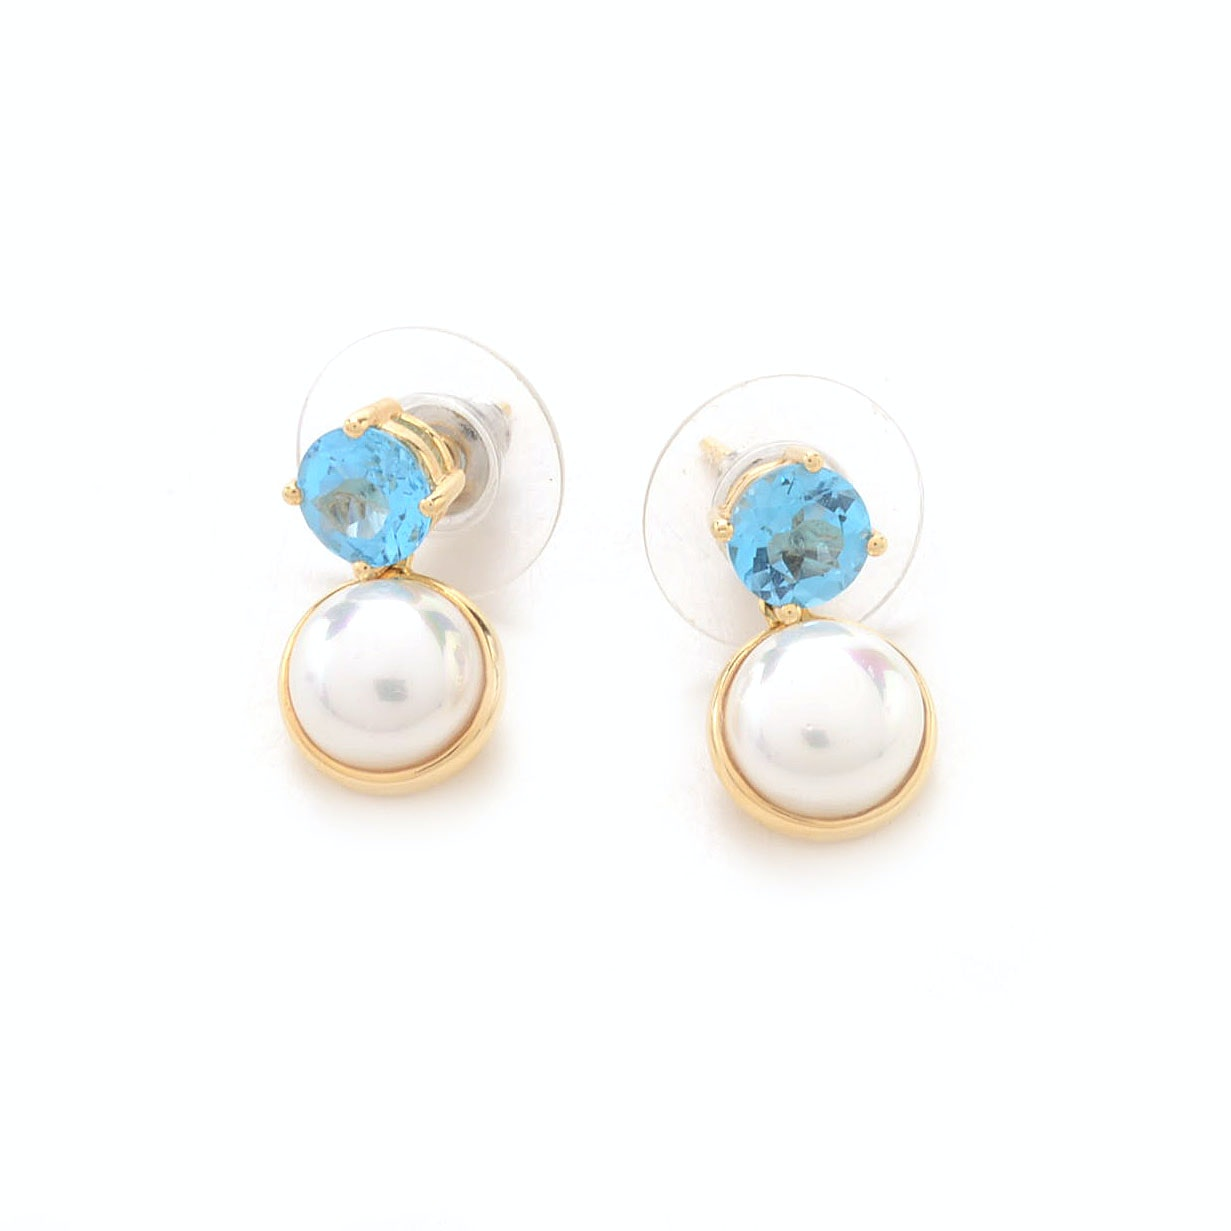 Pair of 14K Yellow Gold Blue Topaz Faux Pearl Earrings